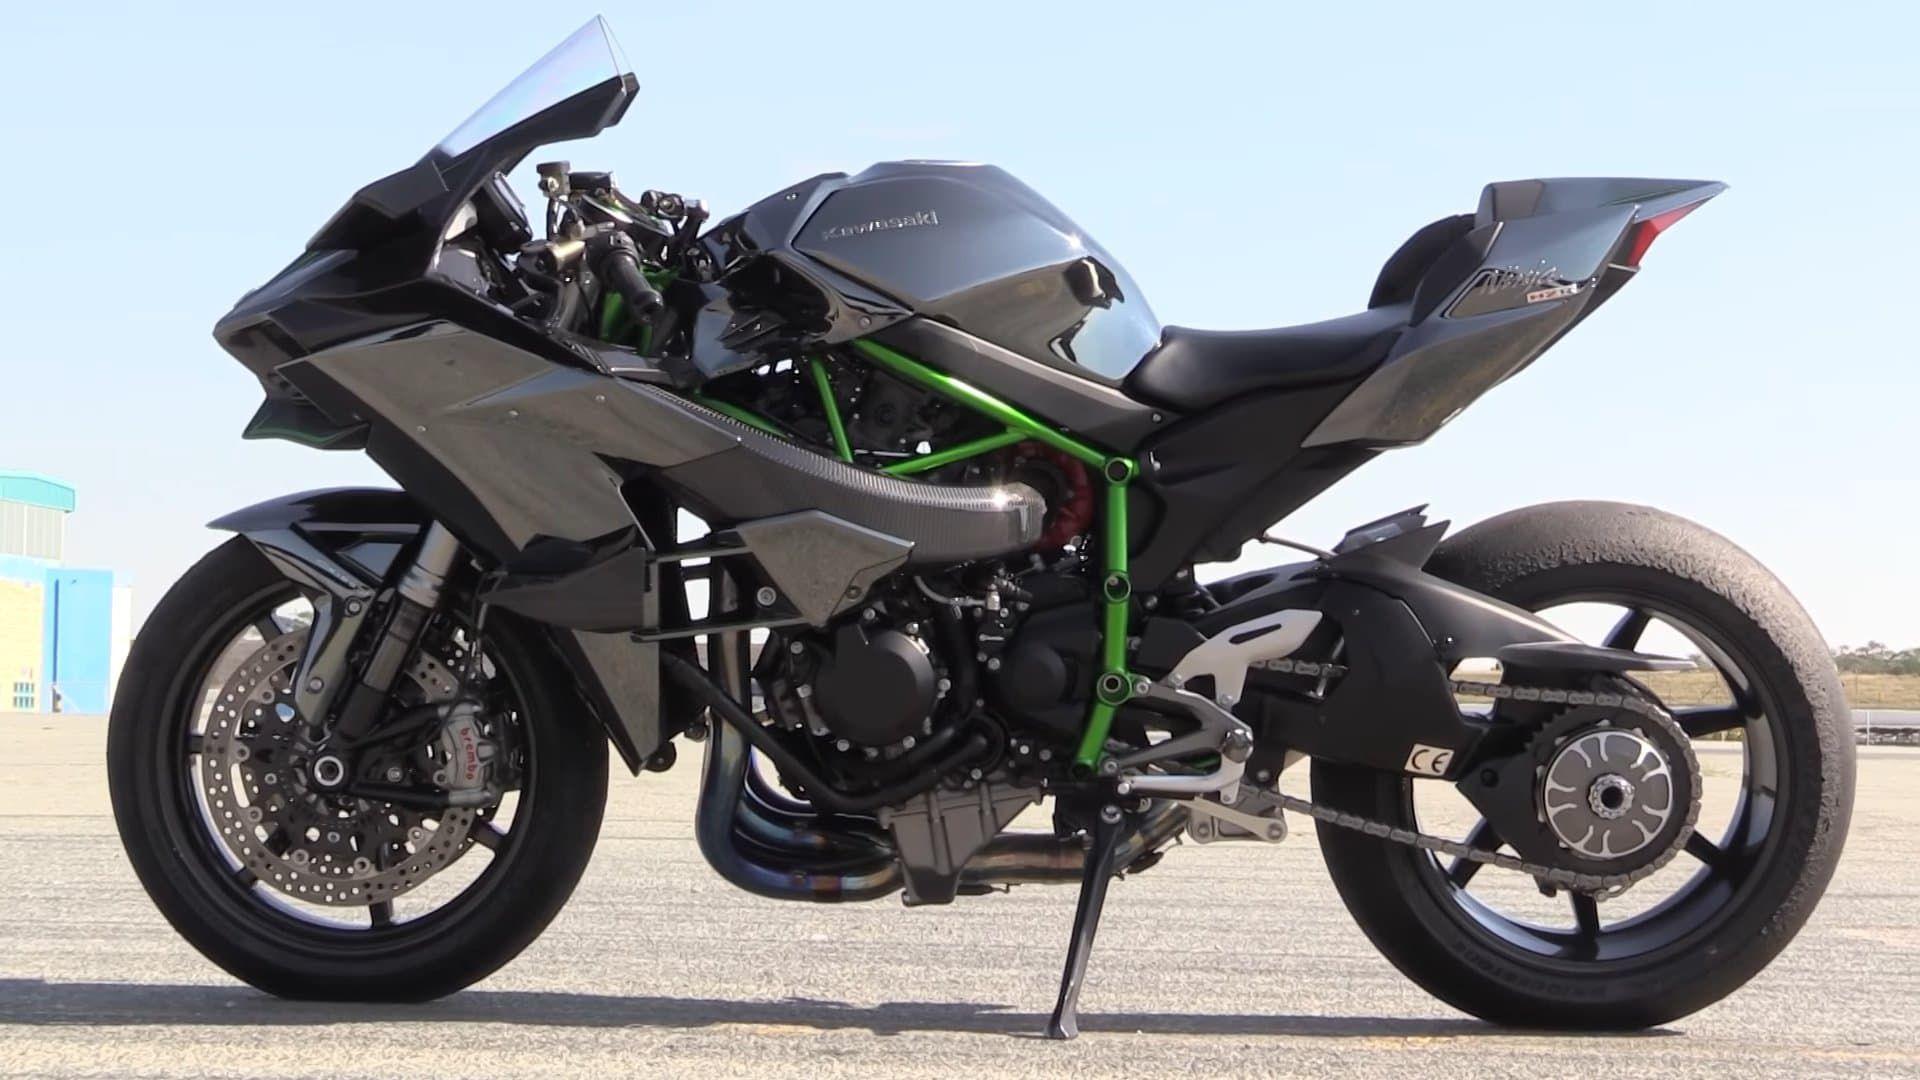 Sport Bike Motorcycle Black Kawasaki Ninja H2r Carbon Bikes2